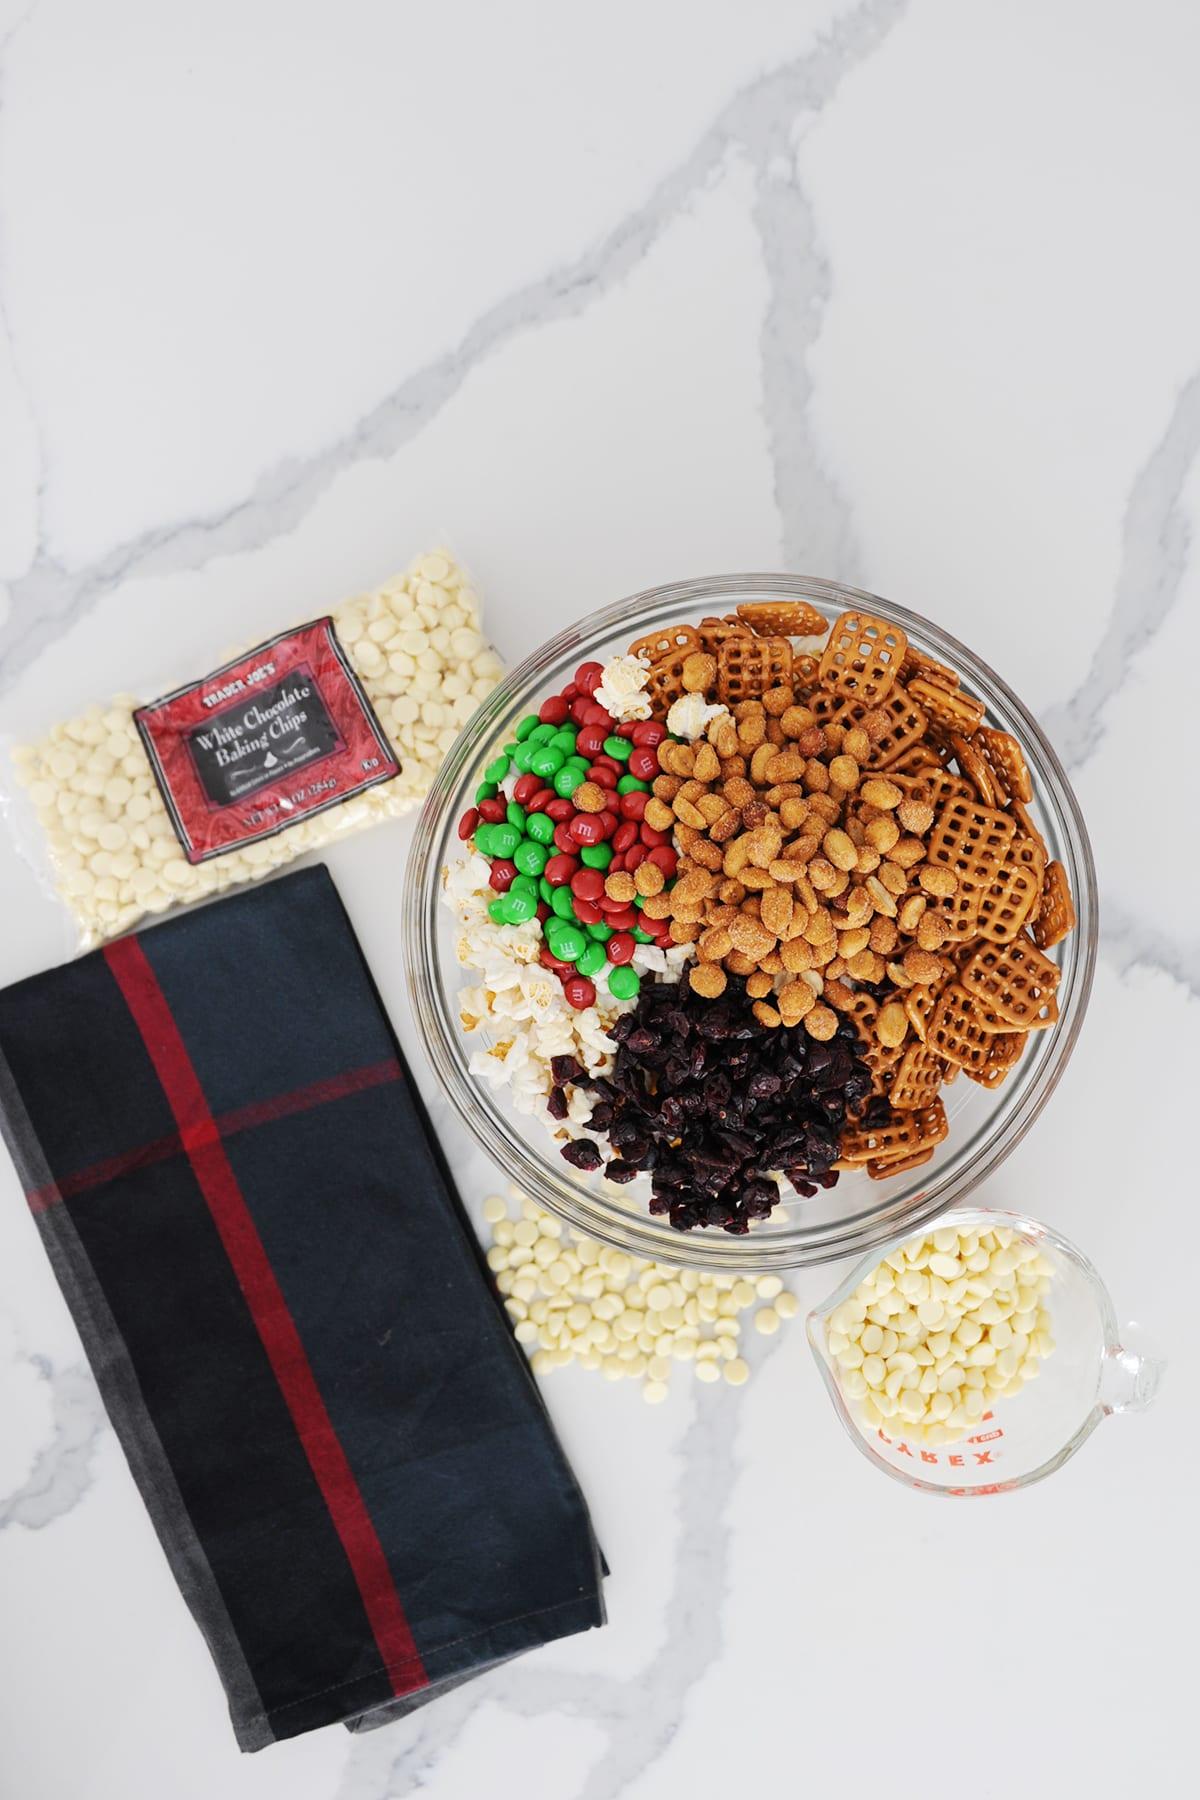 Diy party popcorn mix